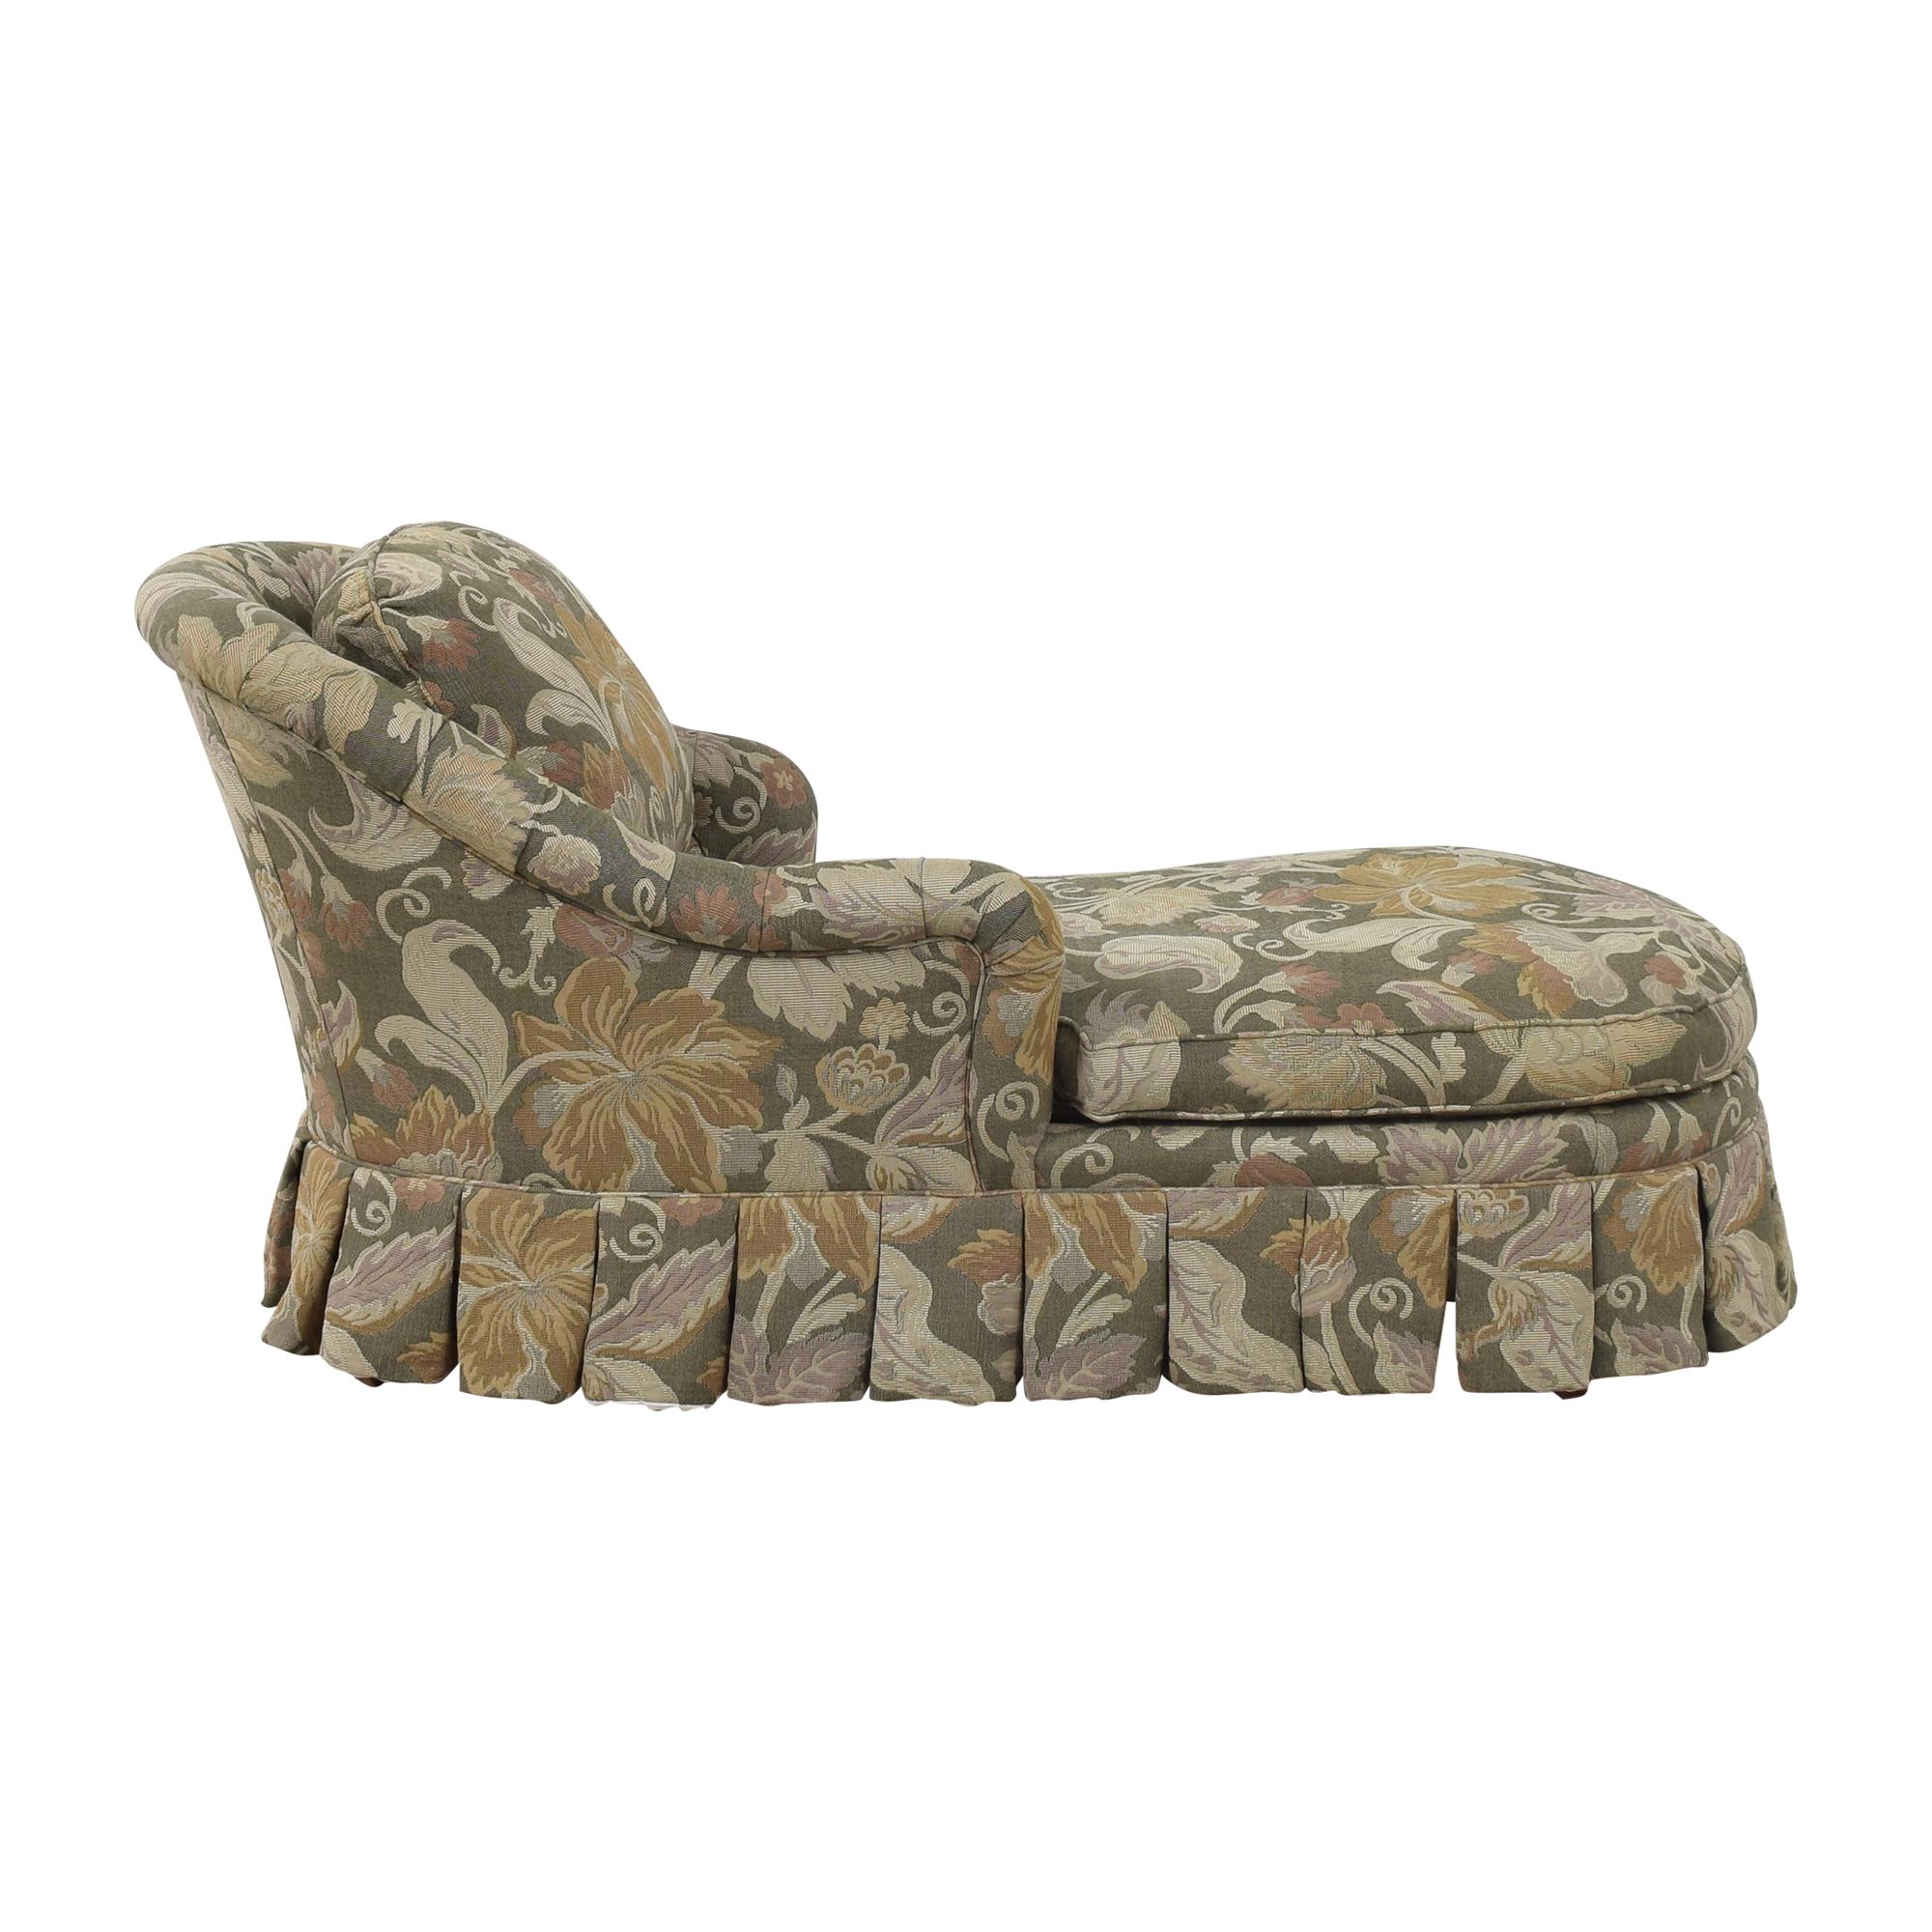 Beacon Hill Collection Beacon Hill Collection Upholstered Chaise nj